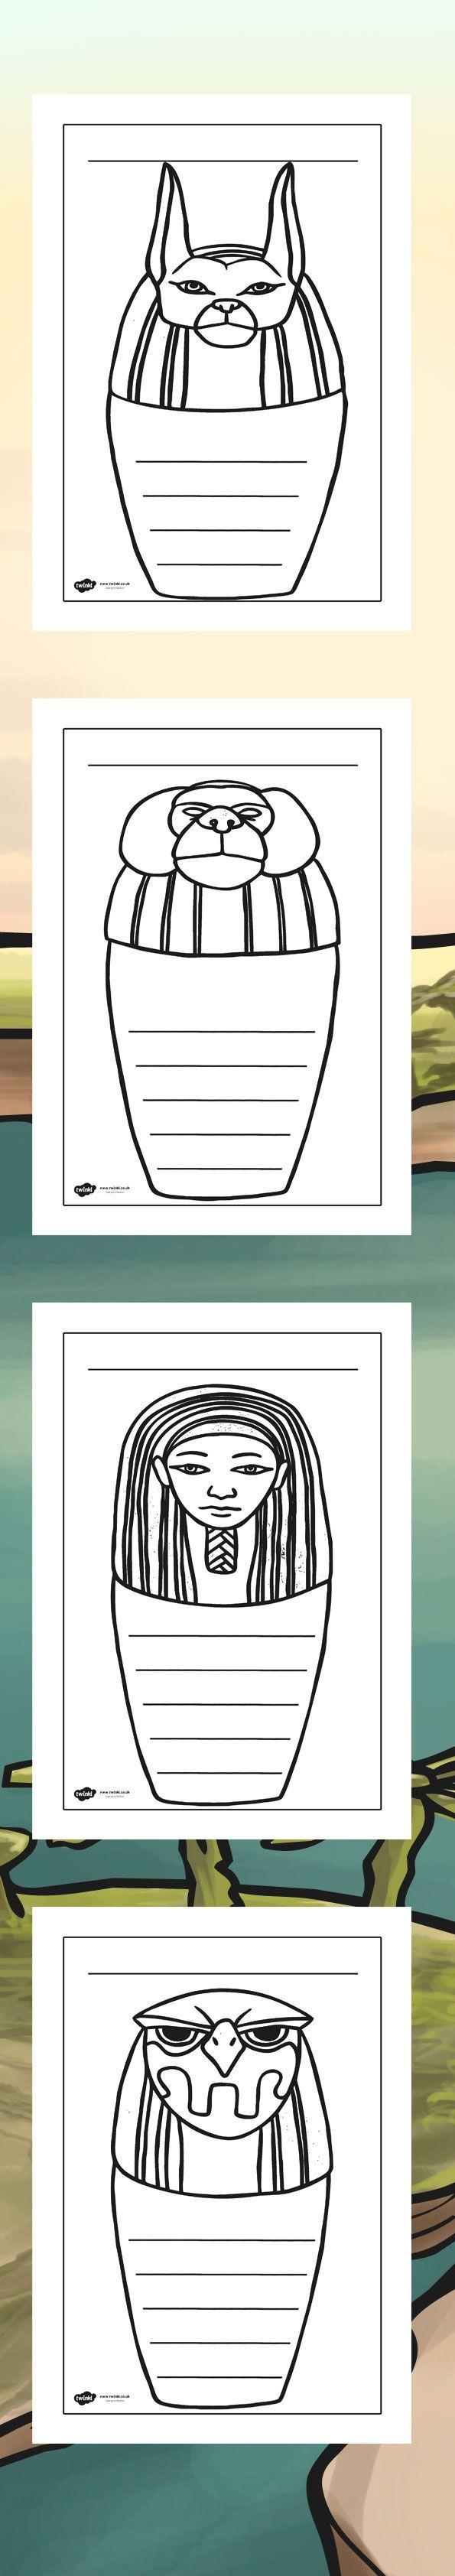 KS2 Ancient Egypt Canopic Jars Writing Frames